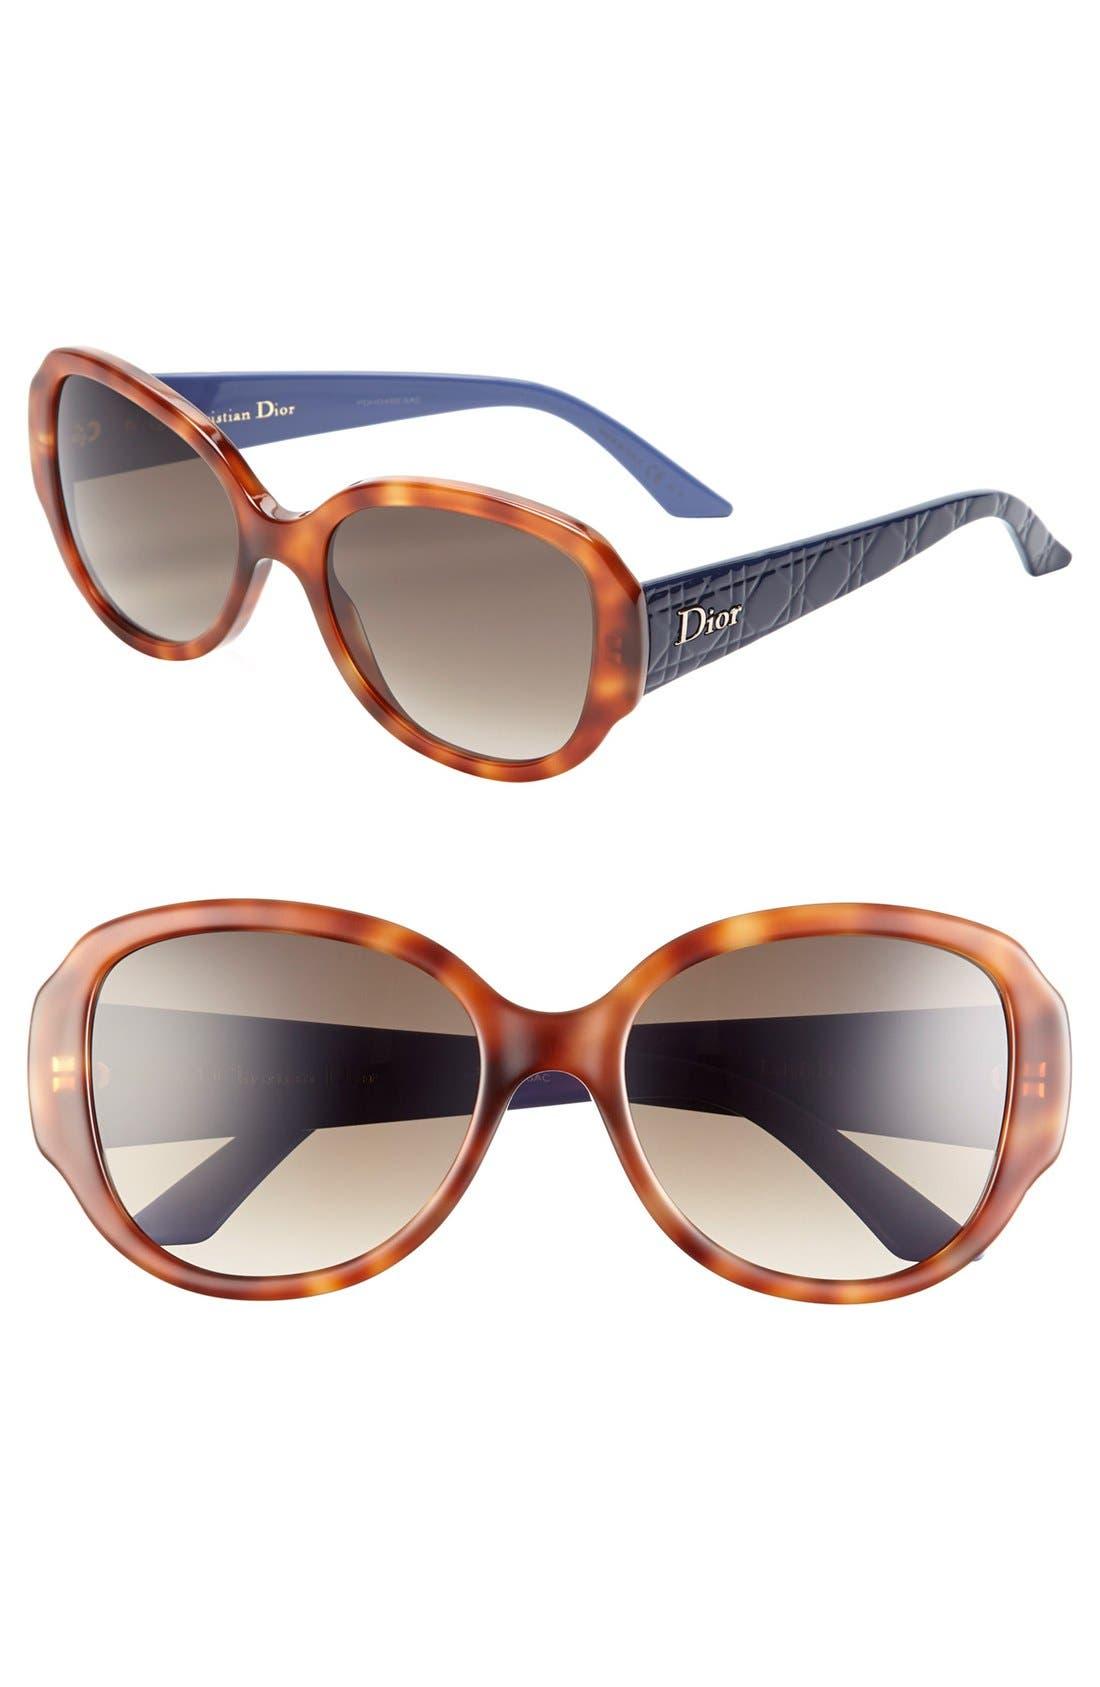 Main Image - Dior 'Lady in Dior' 55mm Sunglasses